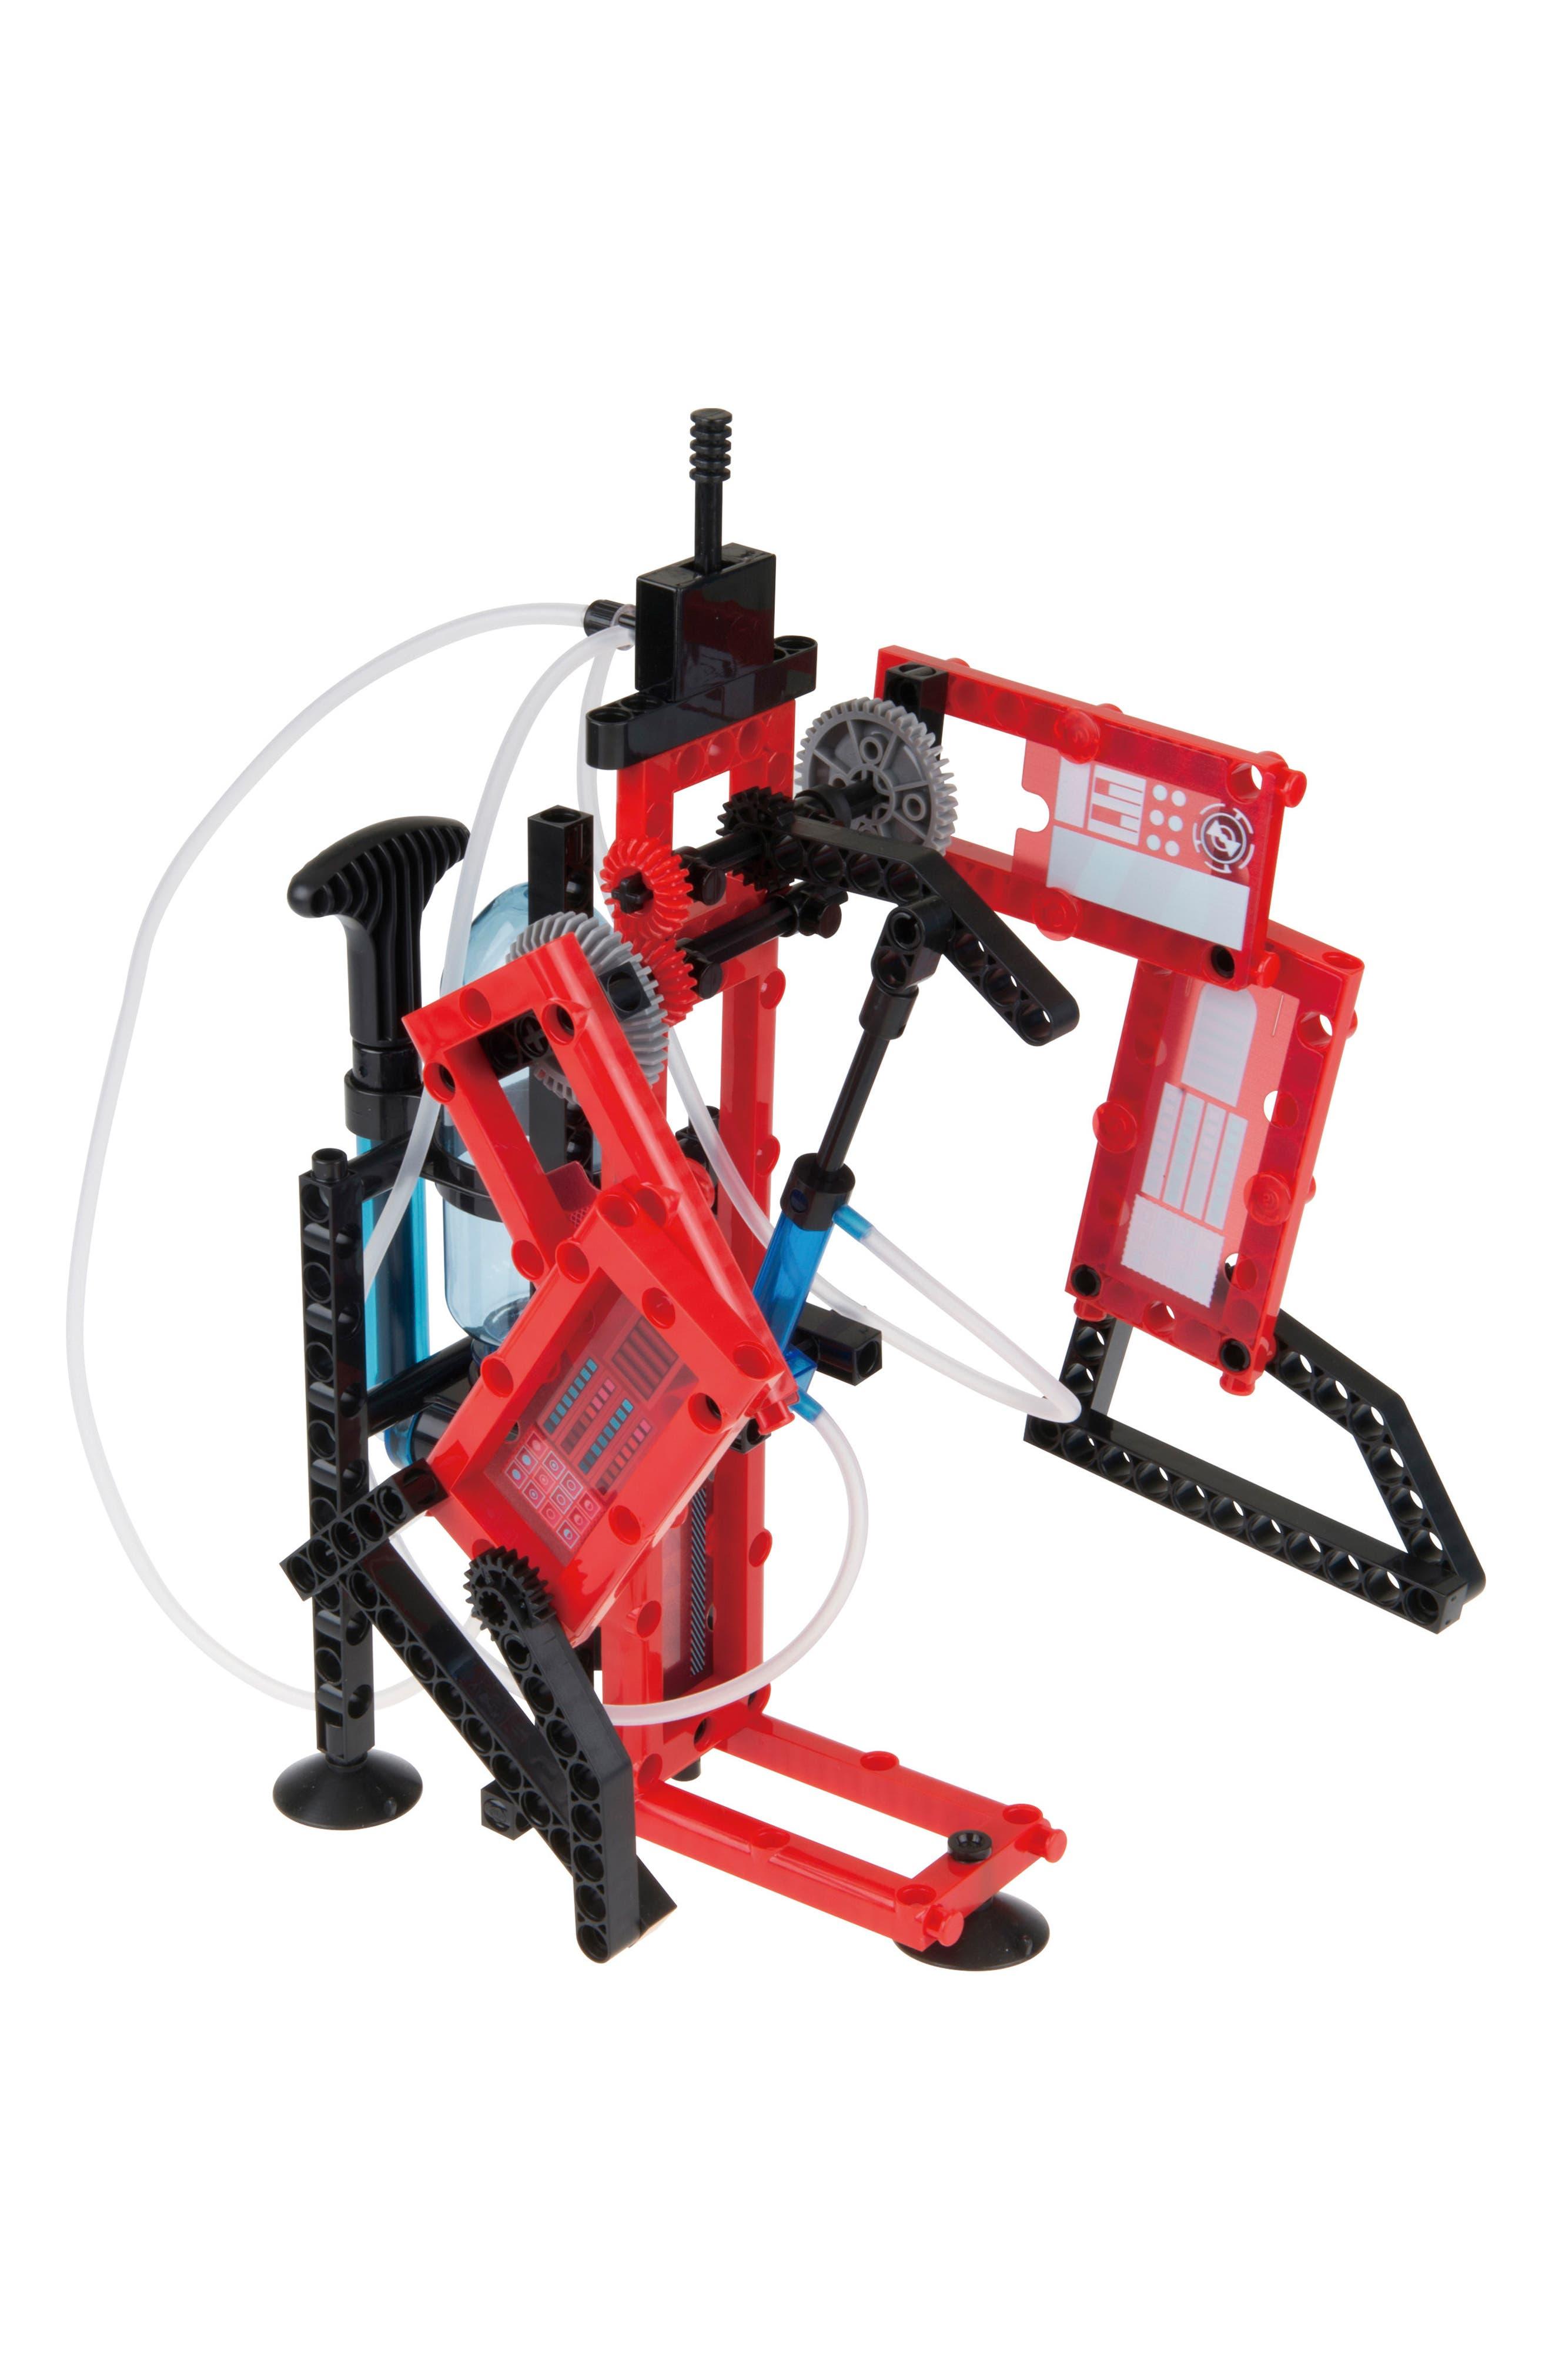 Mechanical Engineering Robotic Arms Kit,                             Alternate thumbnail 9, color,                             Multi